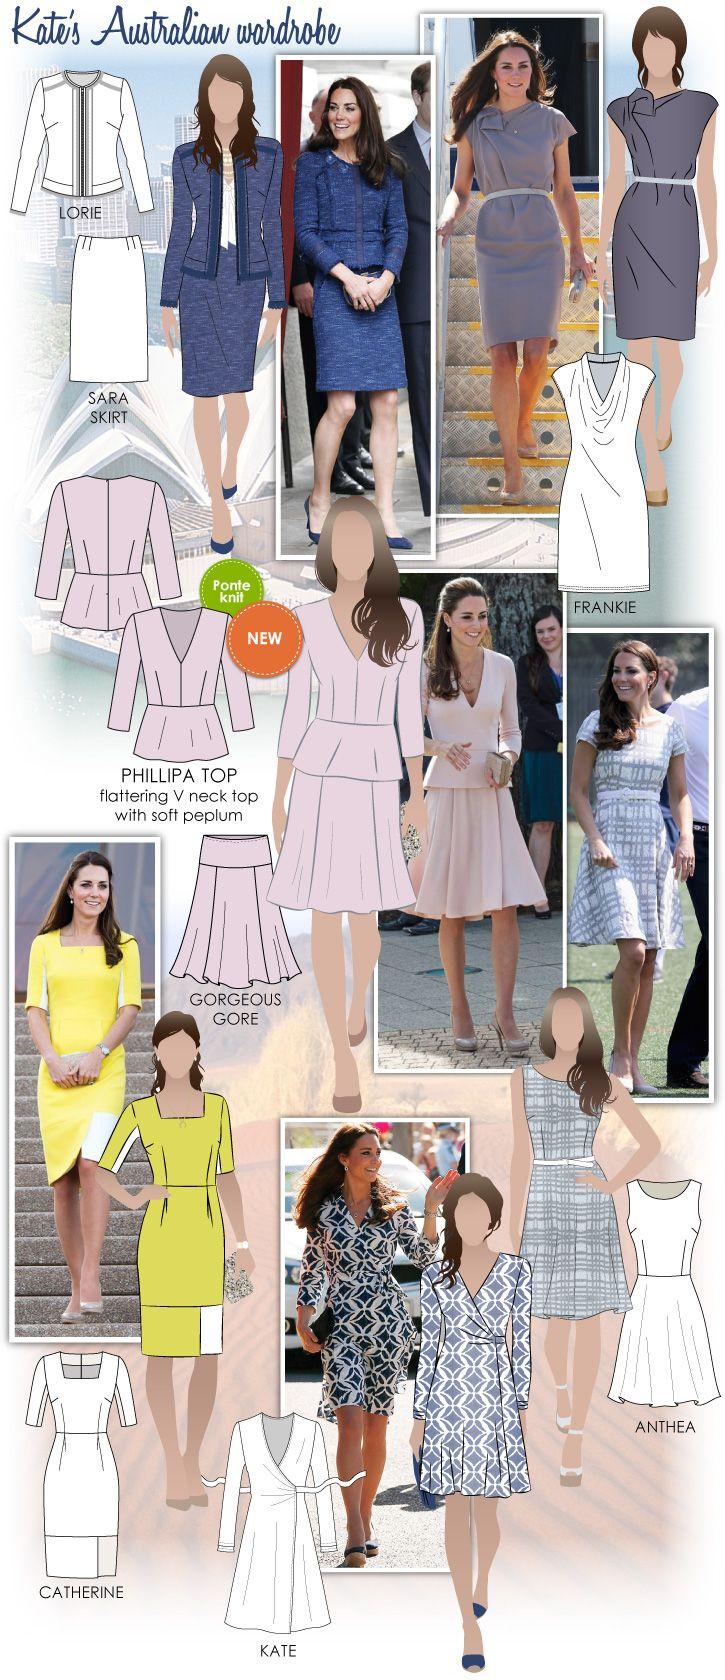 STYLE ARC newsletter - Kate's Australian Wardrobe